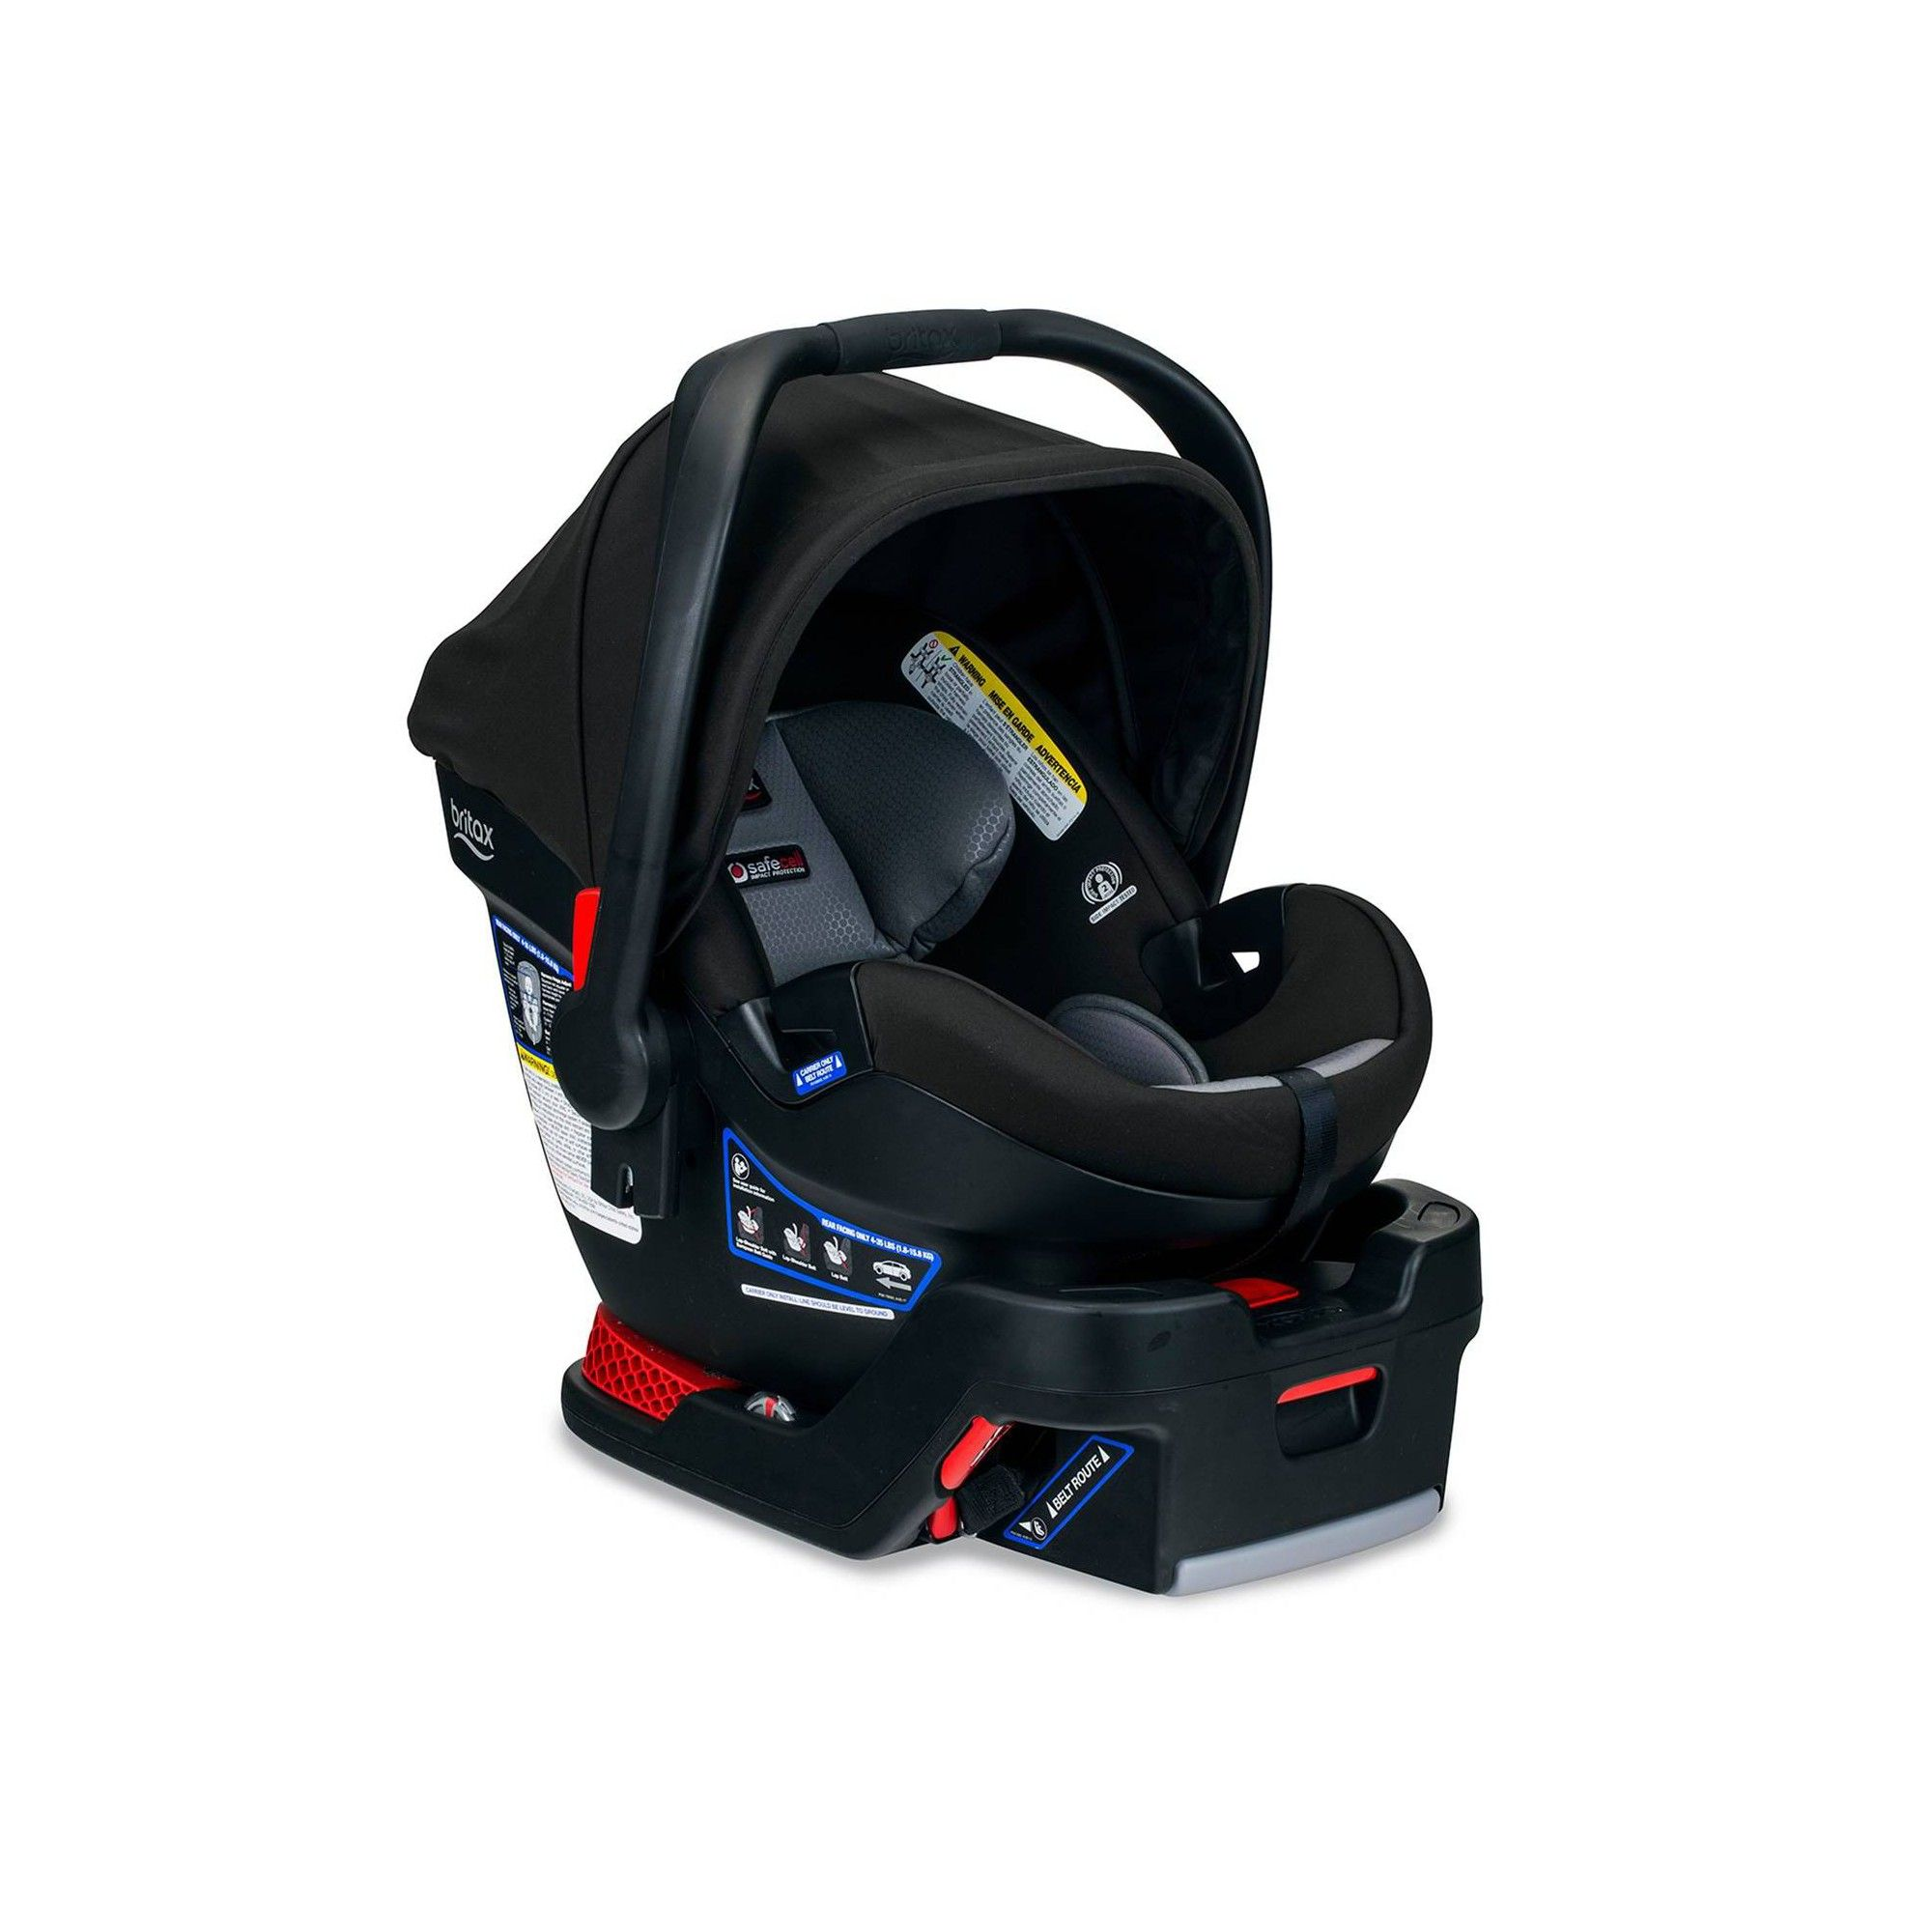 Britax BSafe Ultra Noir Infant Car Seat Black Baby